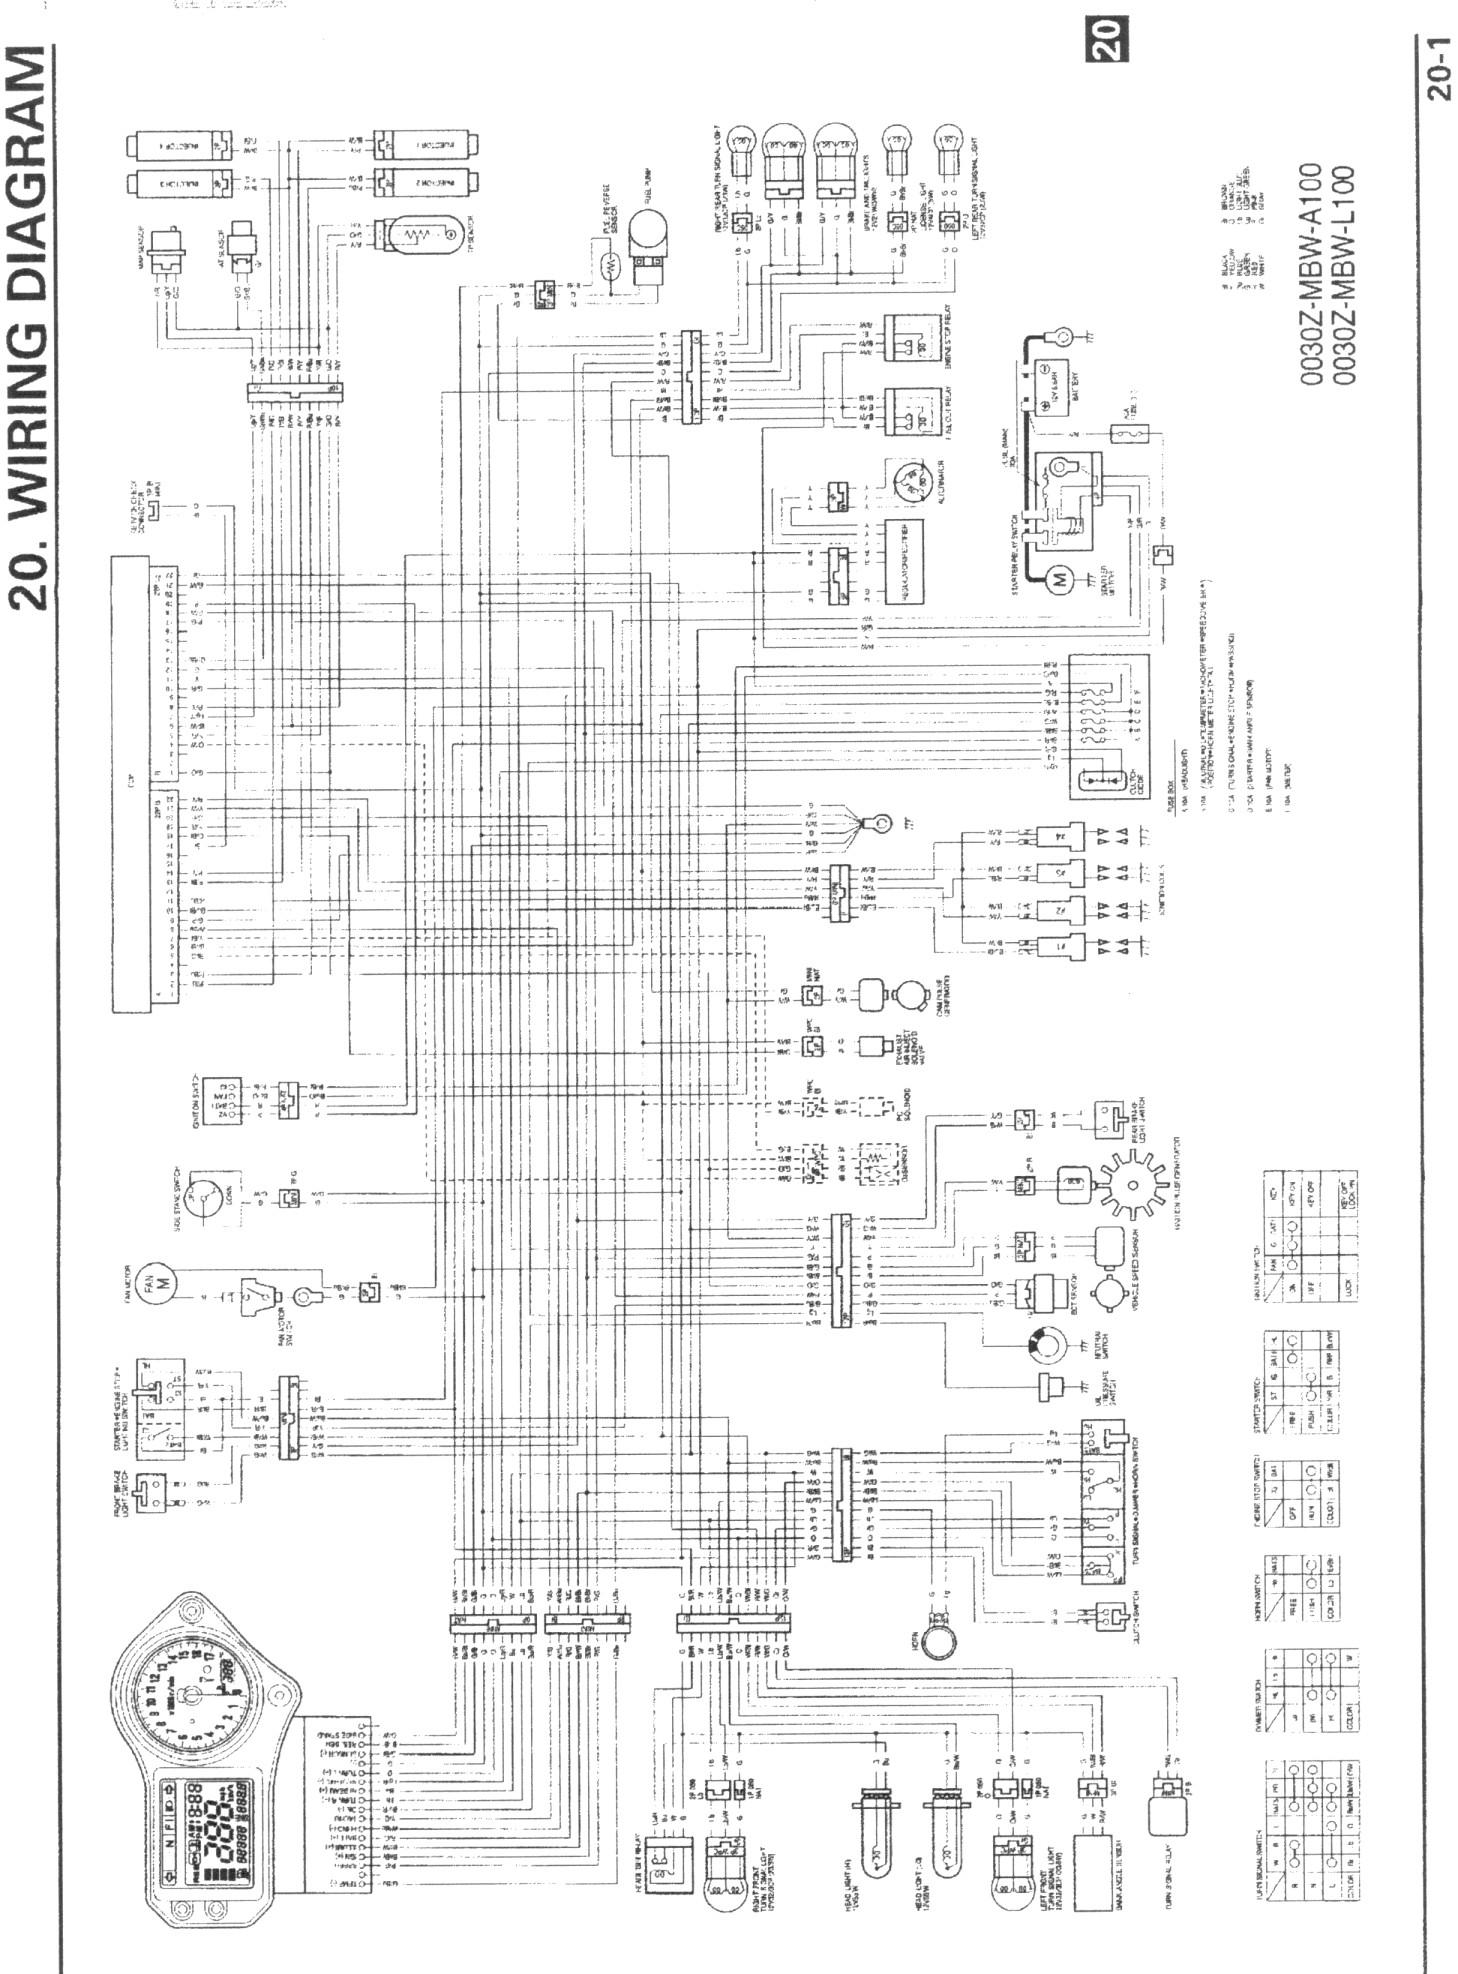 brass knuckles diagram sr20det wiring s13 a 2000 honda cbr 600 f4 free engine